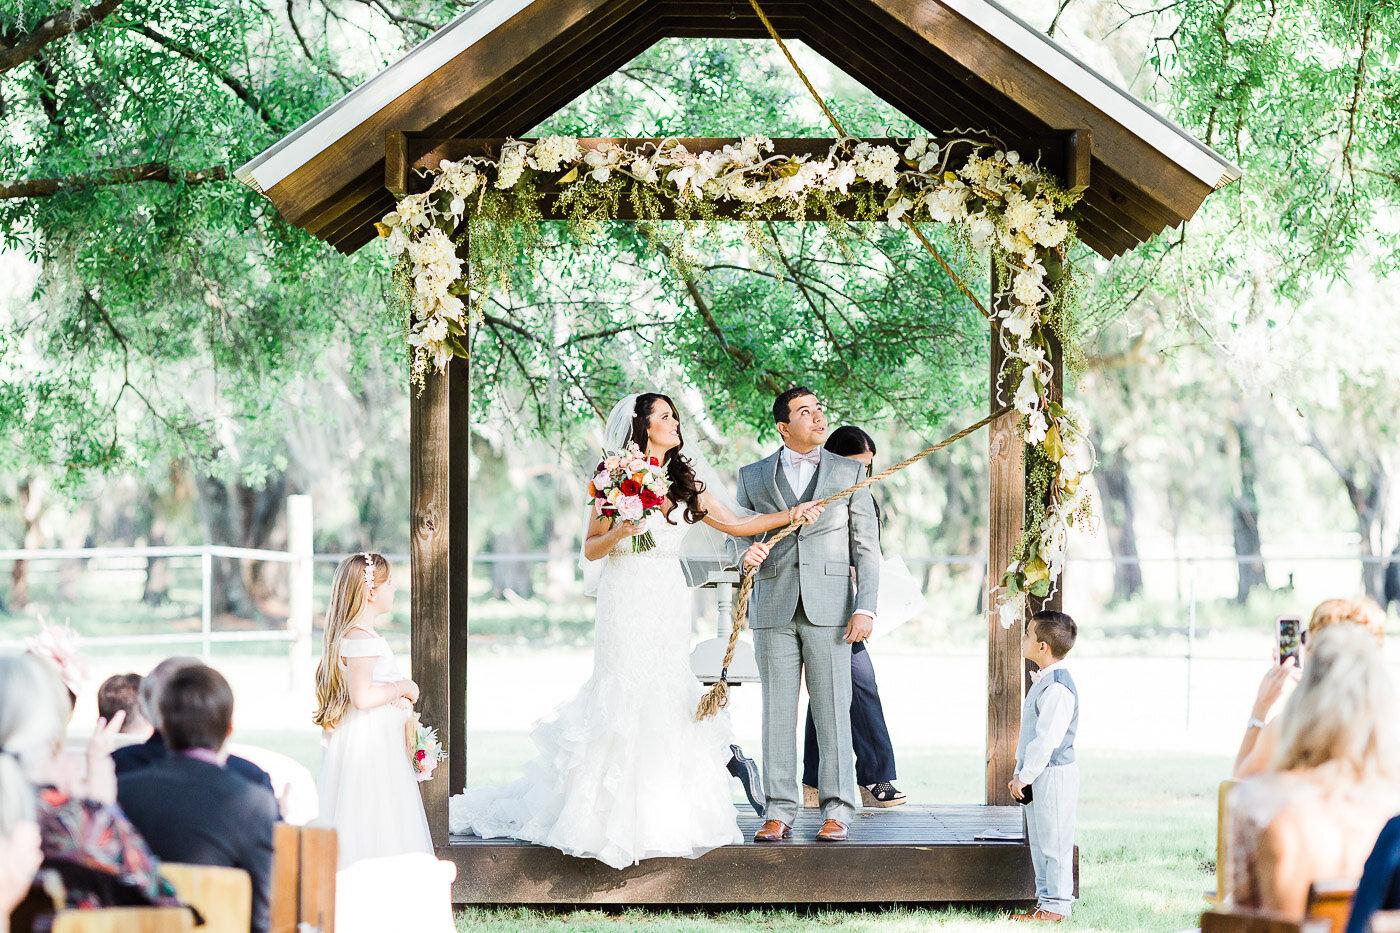 Lakeland-barn-wedding-at-white-horse-ranch-46.jpg